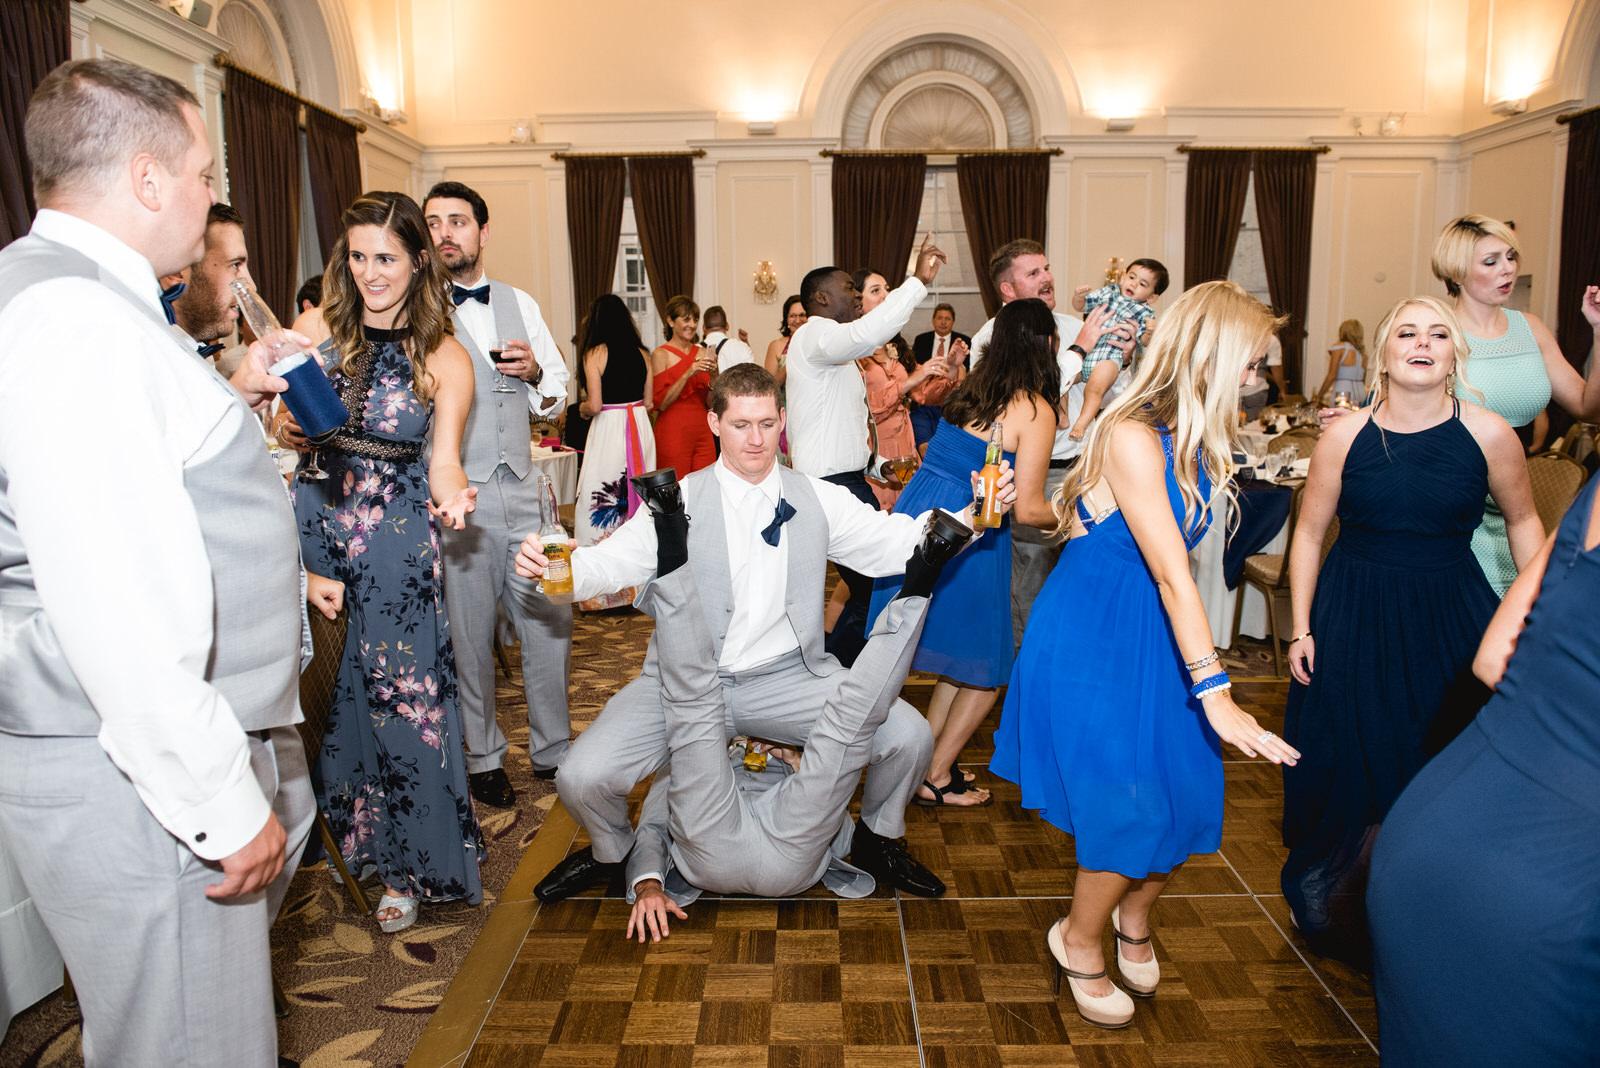 university_club_pittsburgh_wedding_photos_063.jpg